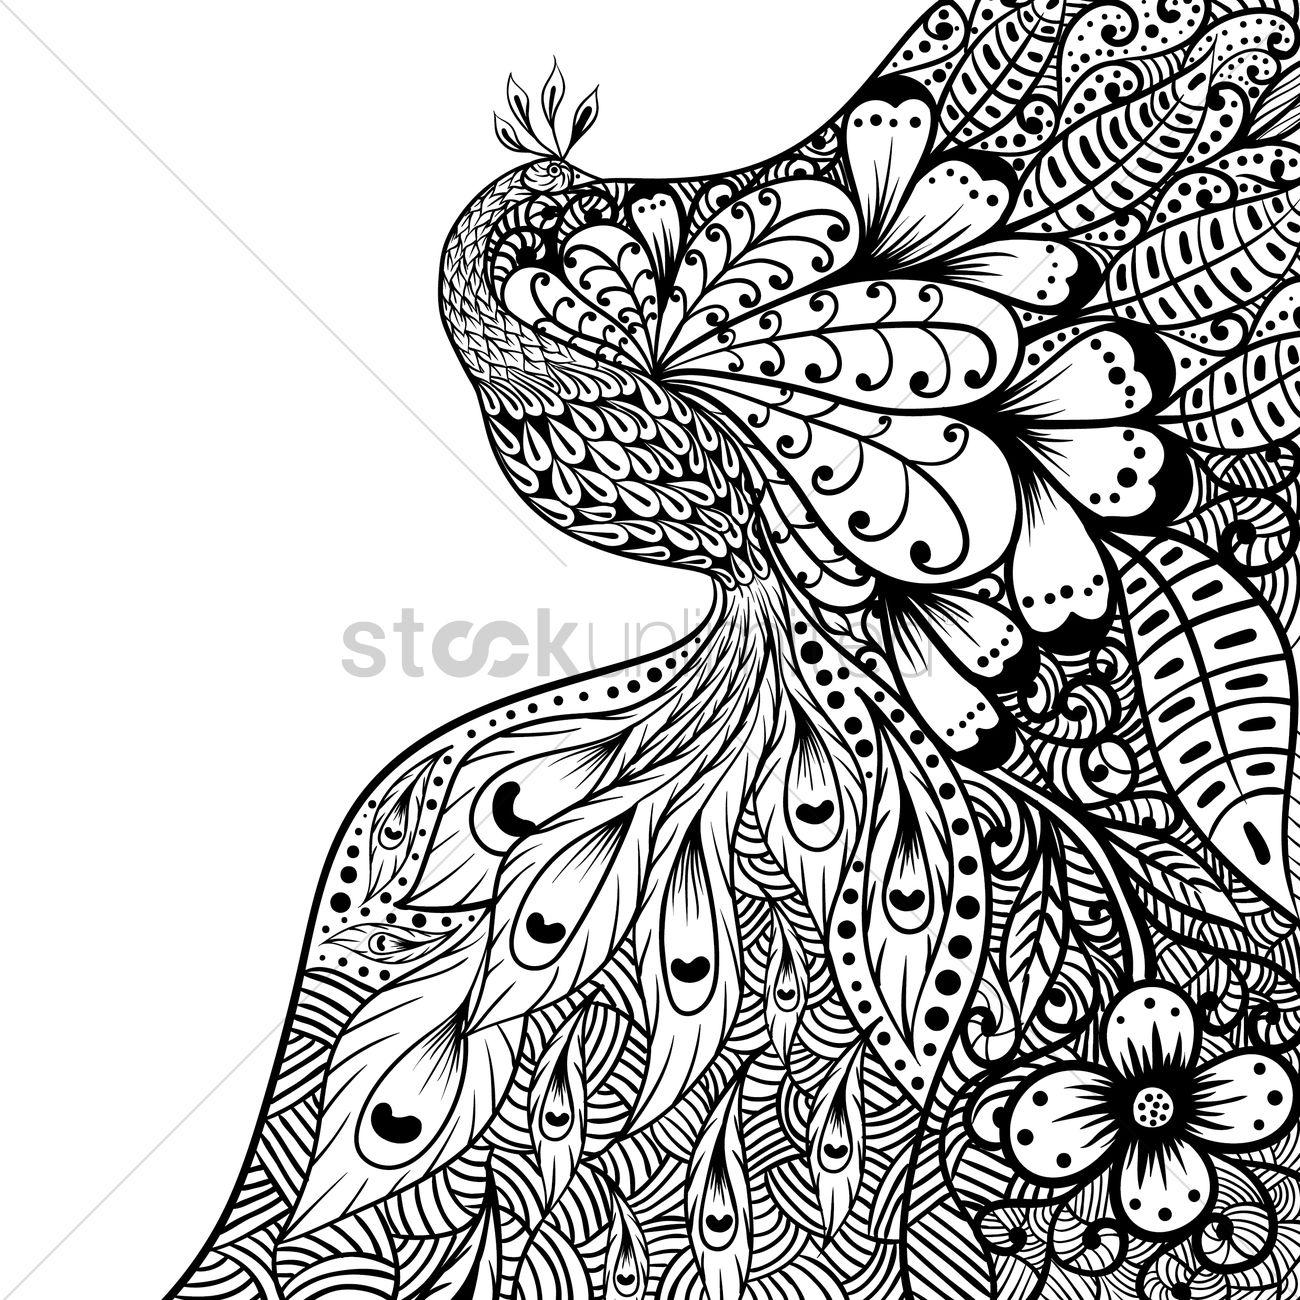 Intricate Peacock Design Vector Image 1617601